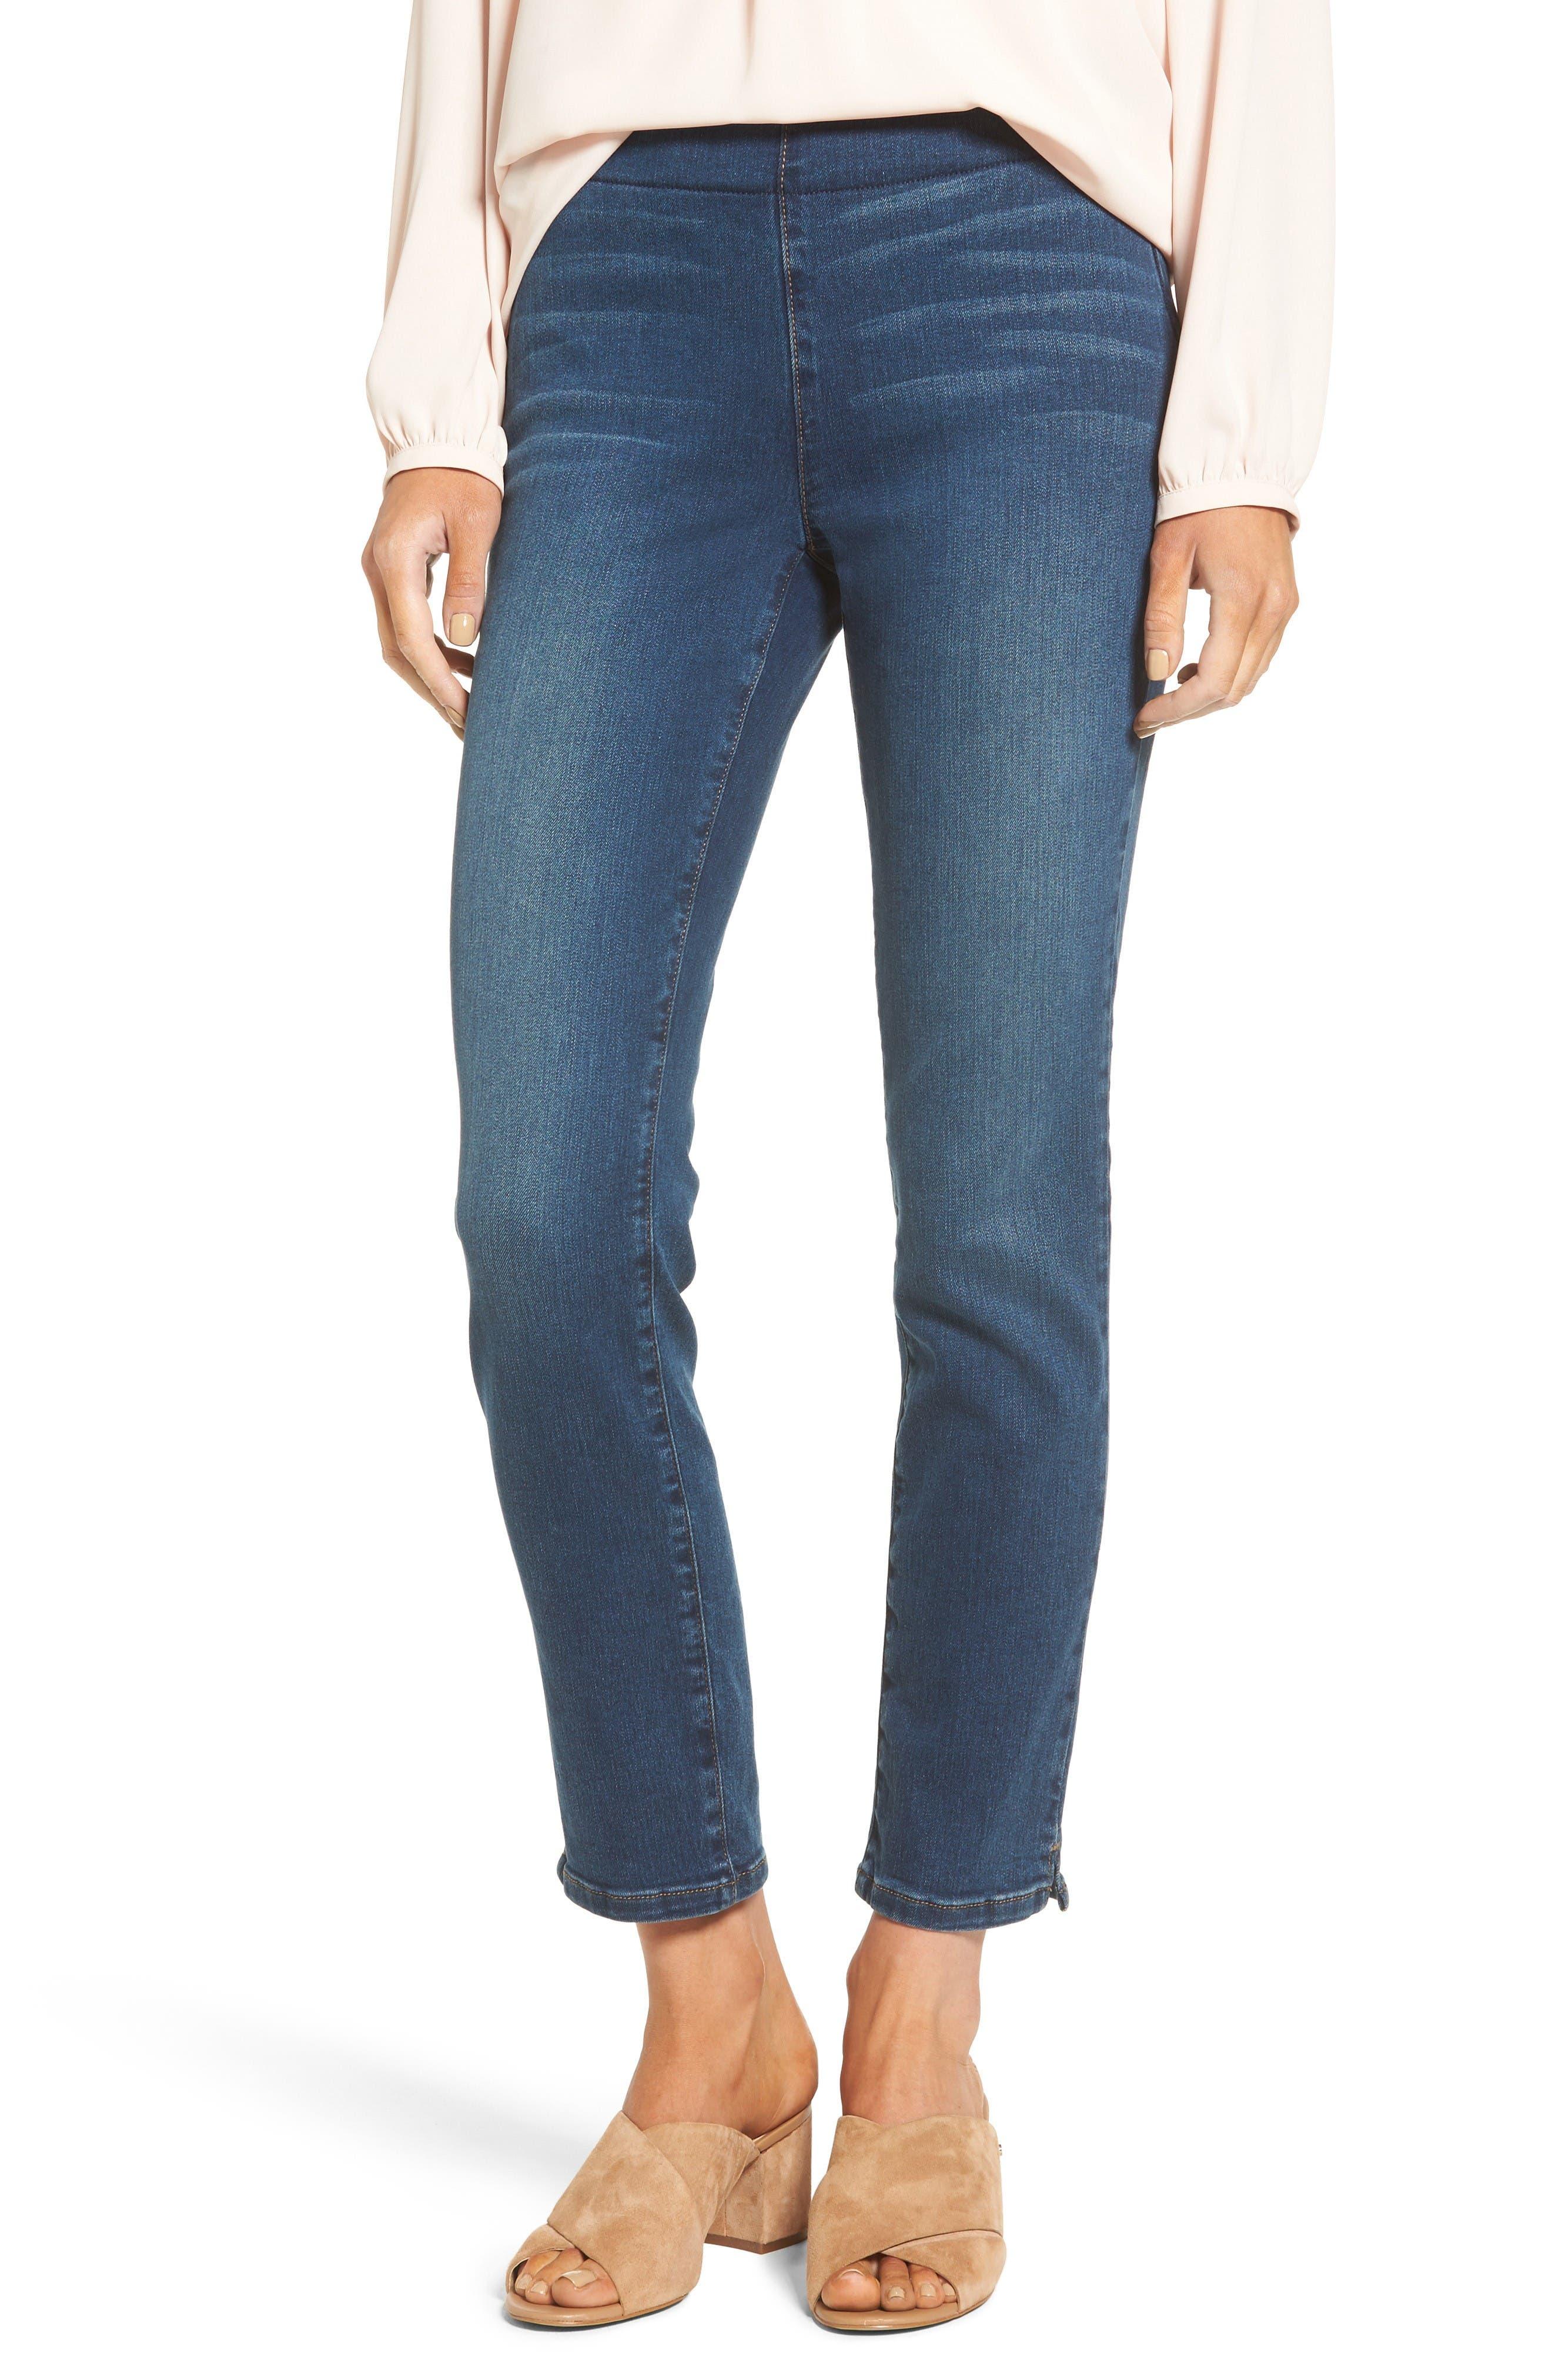 Alternate Image 1 Selected - NYDJ Alina Pull-On Stretch Ankle Skinny Jeans (Sea Breeze) (Regular & Petite)